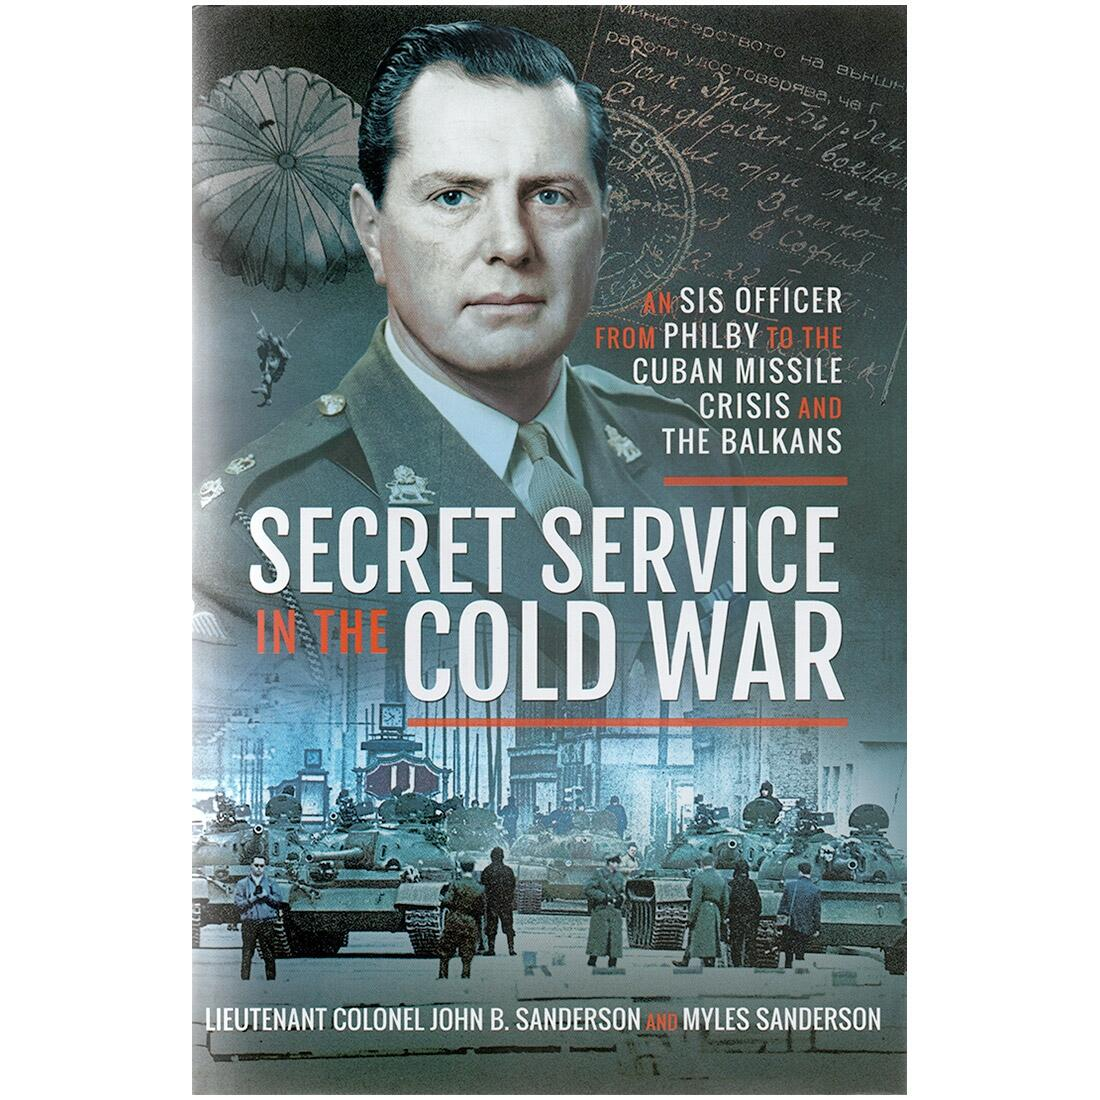 Secret Service In The Cold War by Lieutenant Colonel John B. Sanderson and Myles Sanderson (Book)